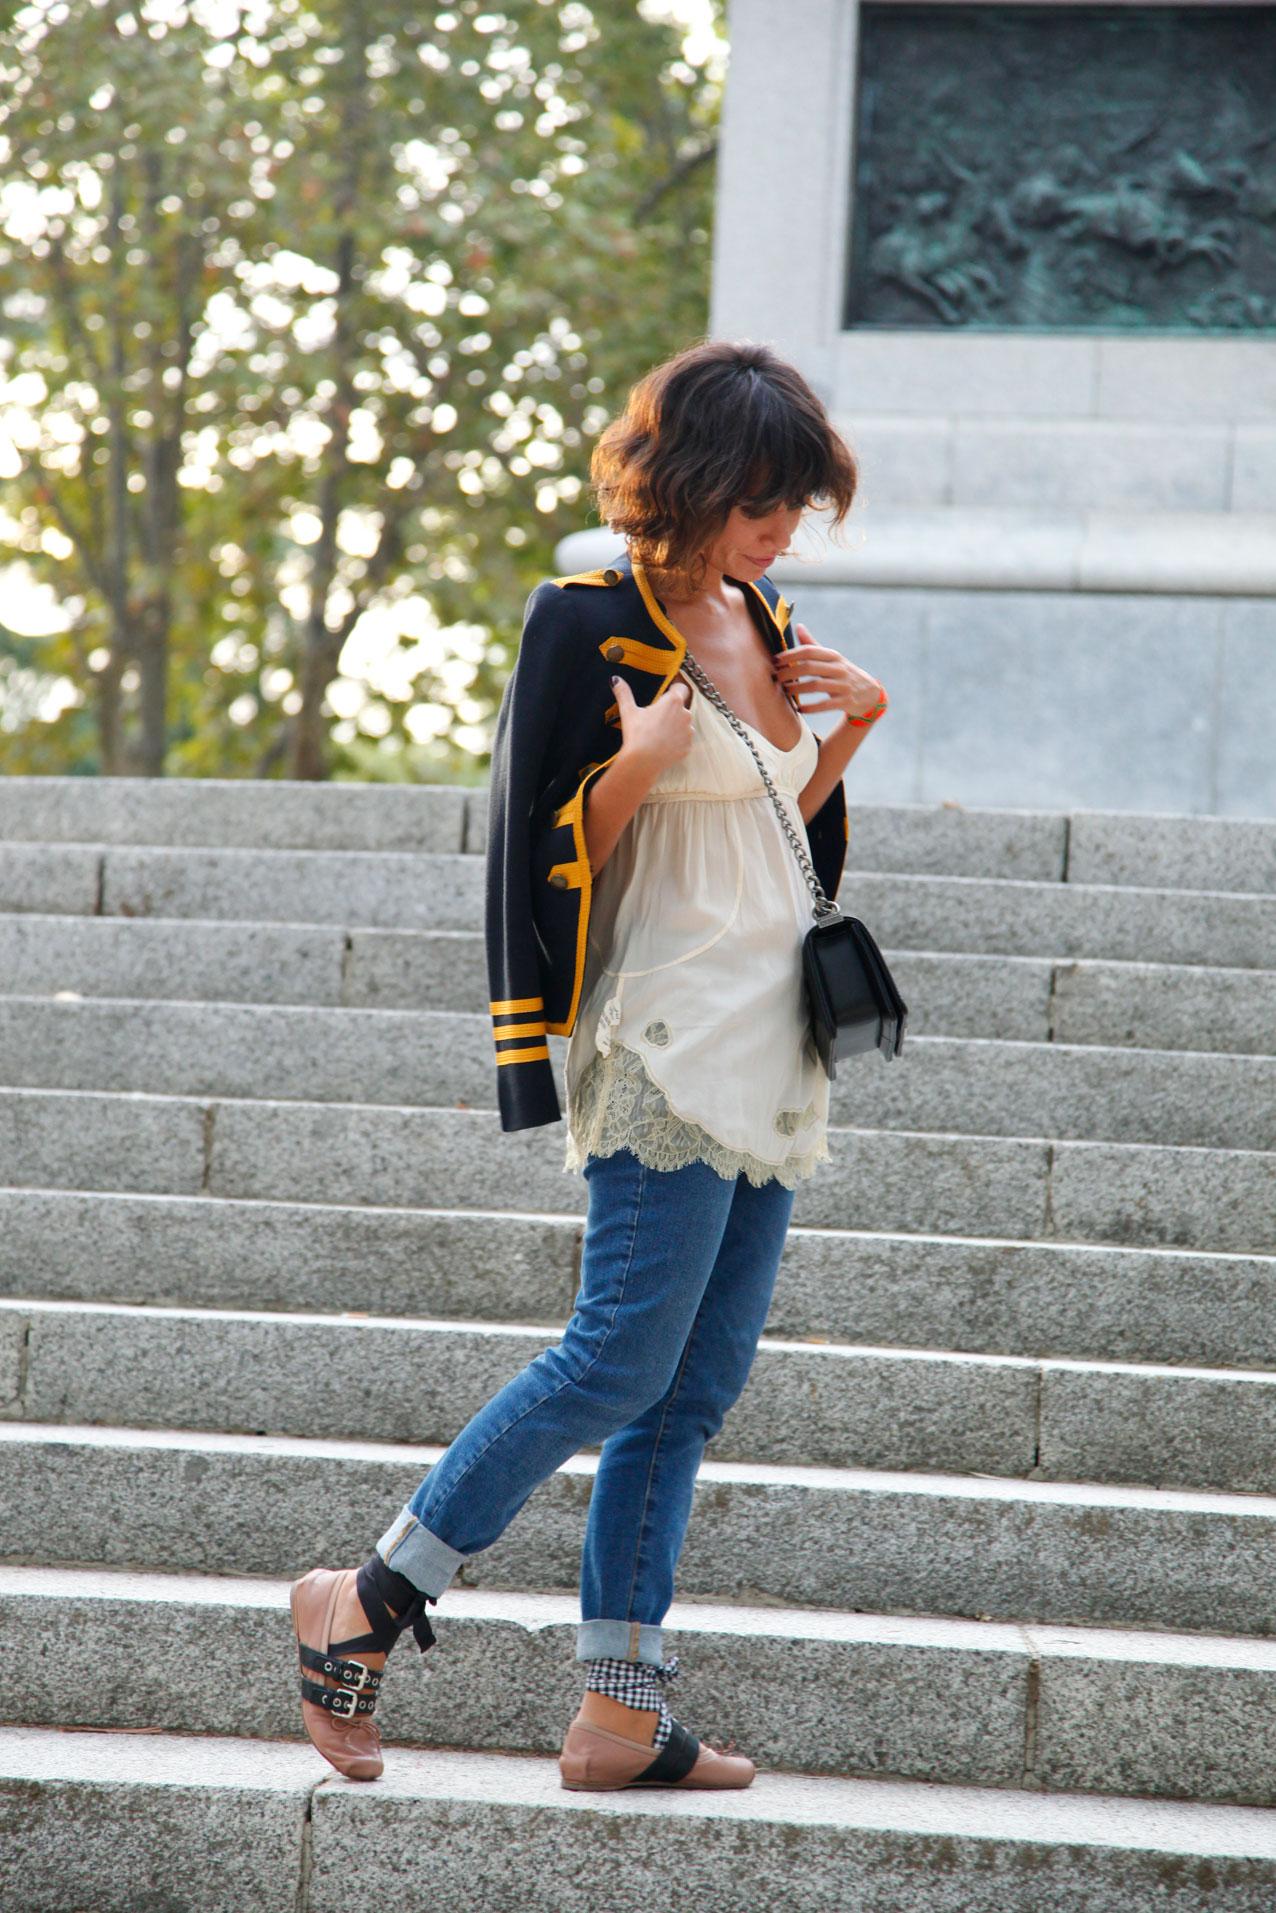 militar_jacket-lencero_autumn_look_miumiu_ballerinas_streetstyle-cool_lemonade-9